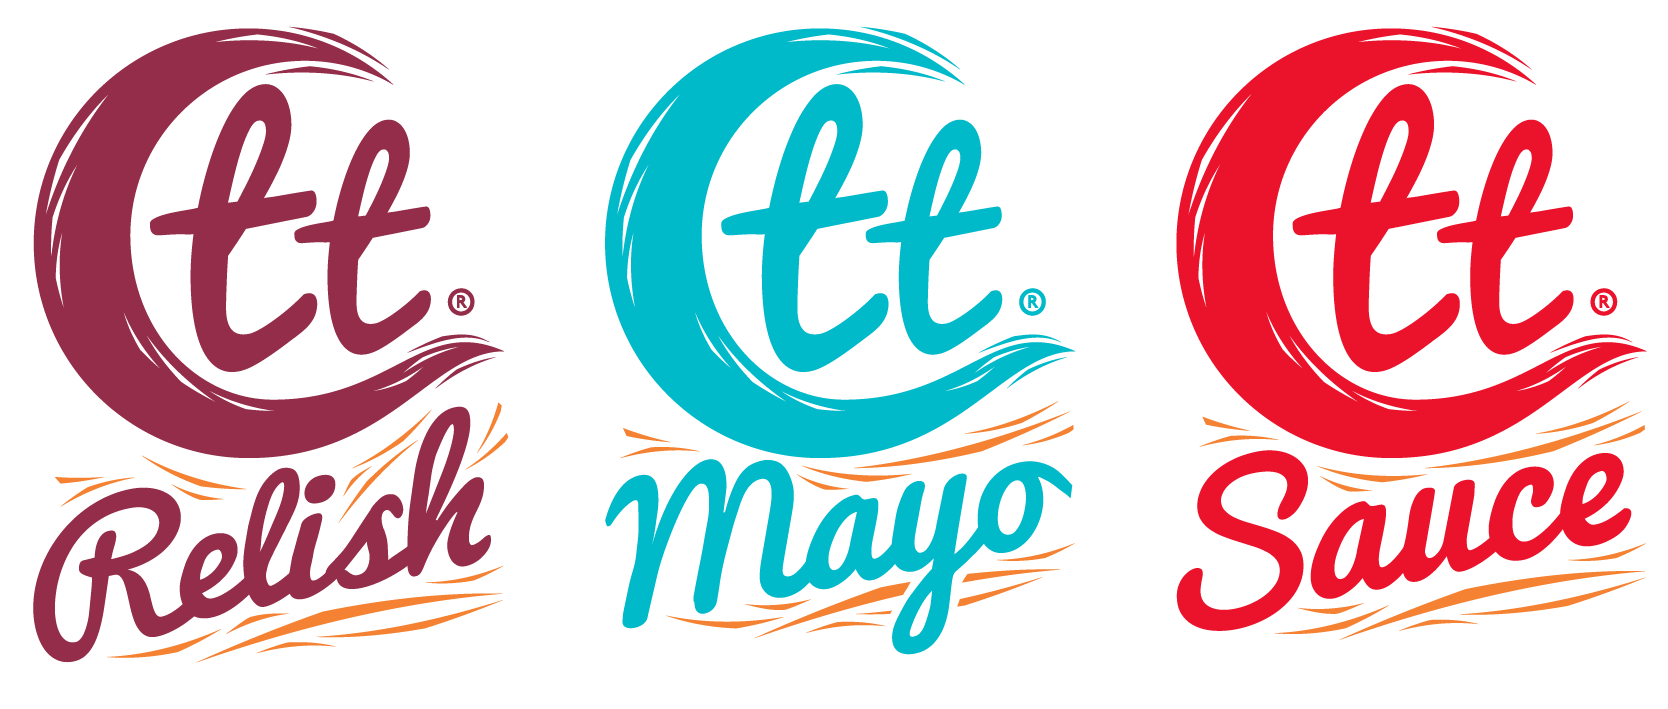 TT Sauce / Concept logo designs